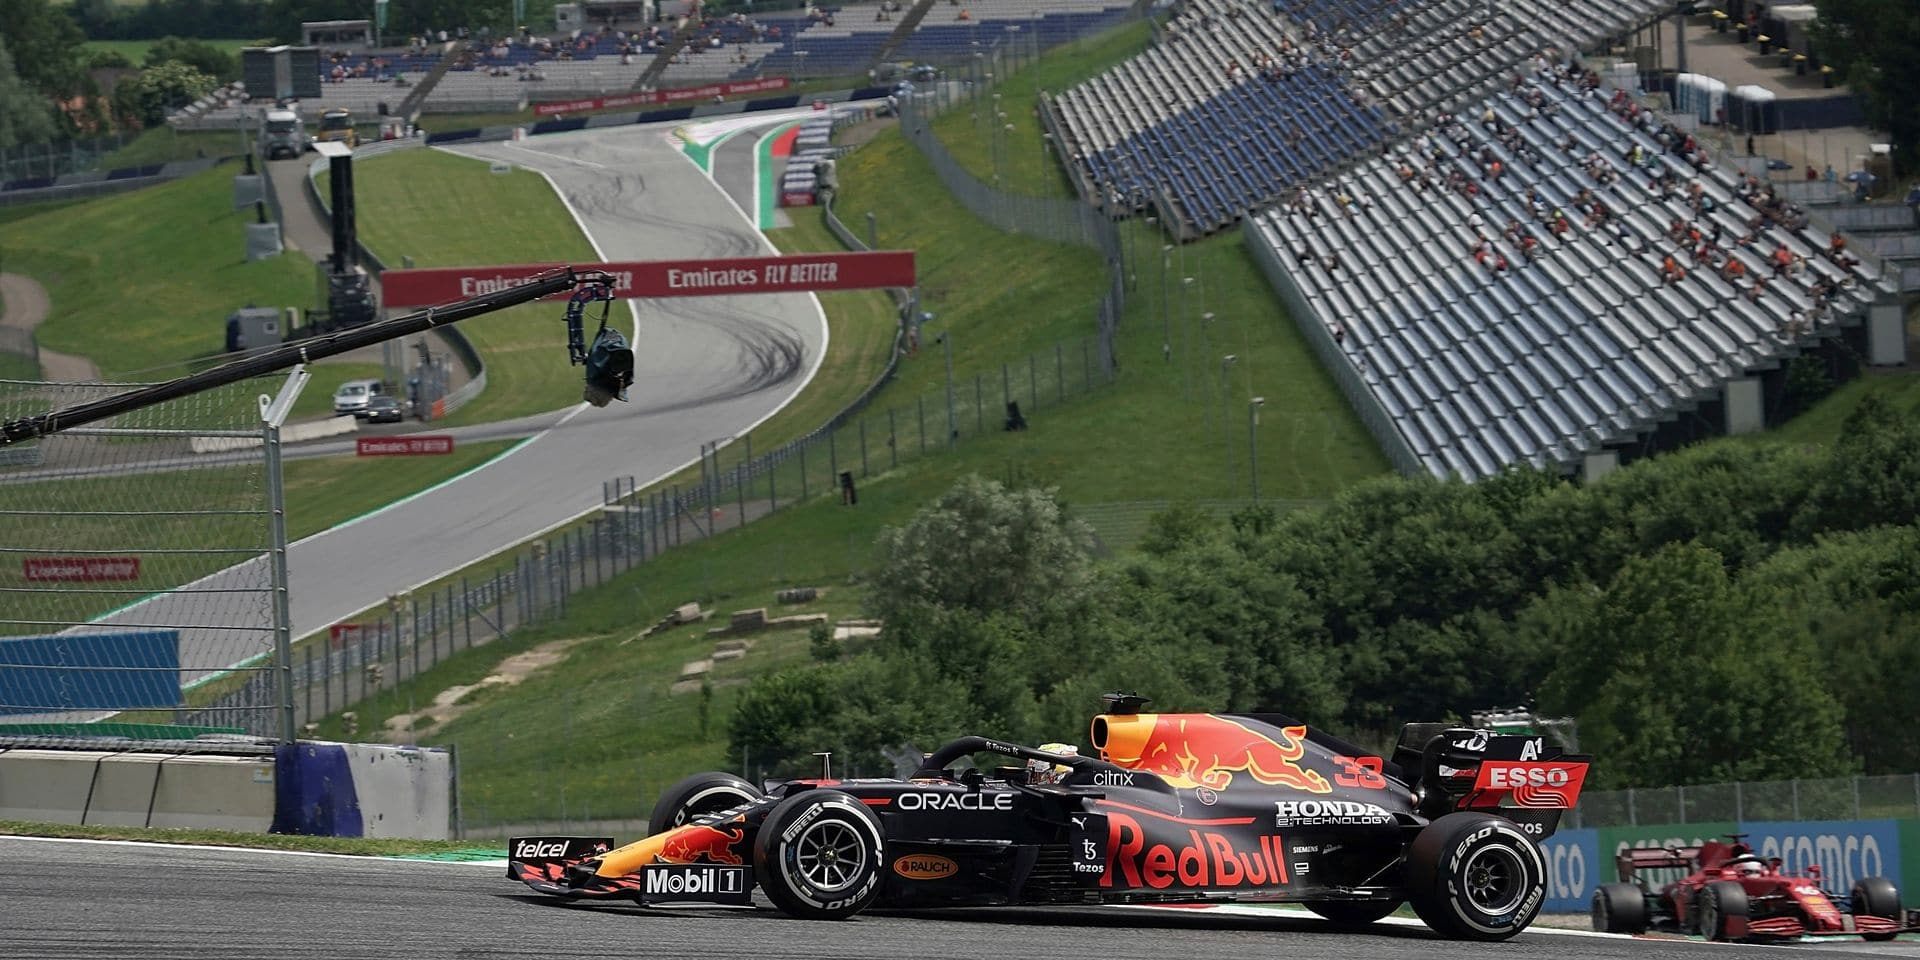 Formula 1 BWT Grand Prix of Styria 2021